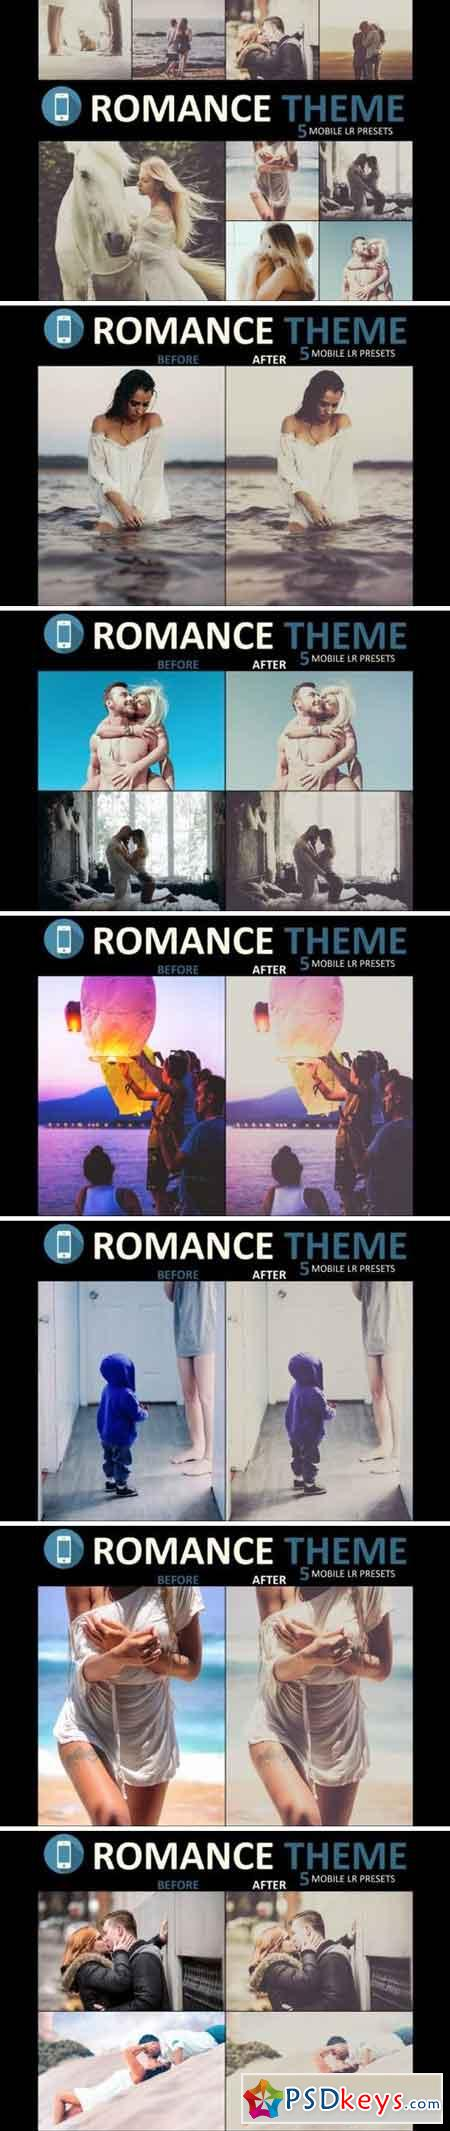 Neo Romance mobile lightroom presets theme 3522576